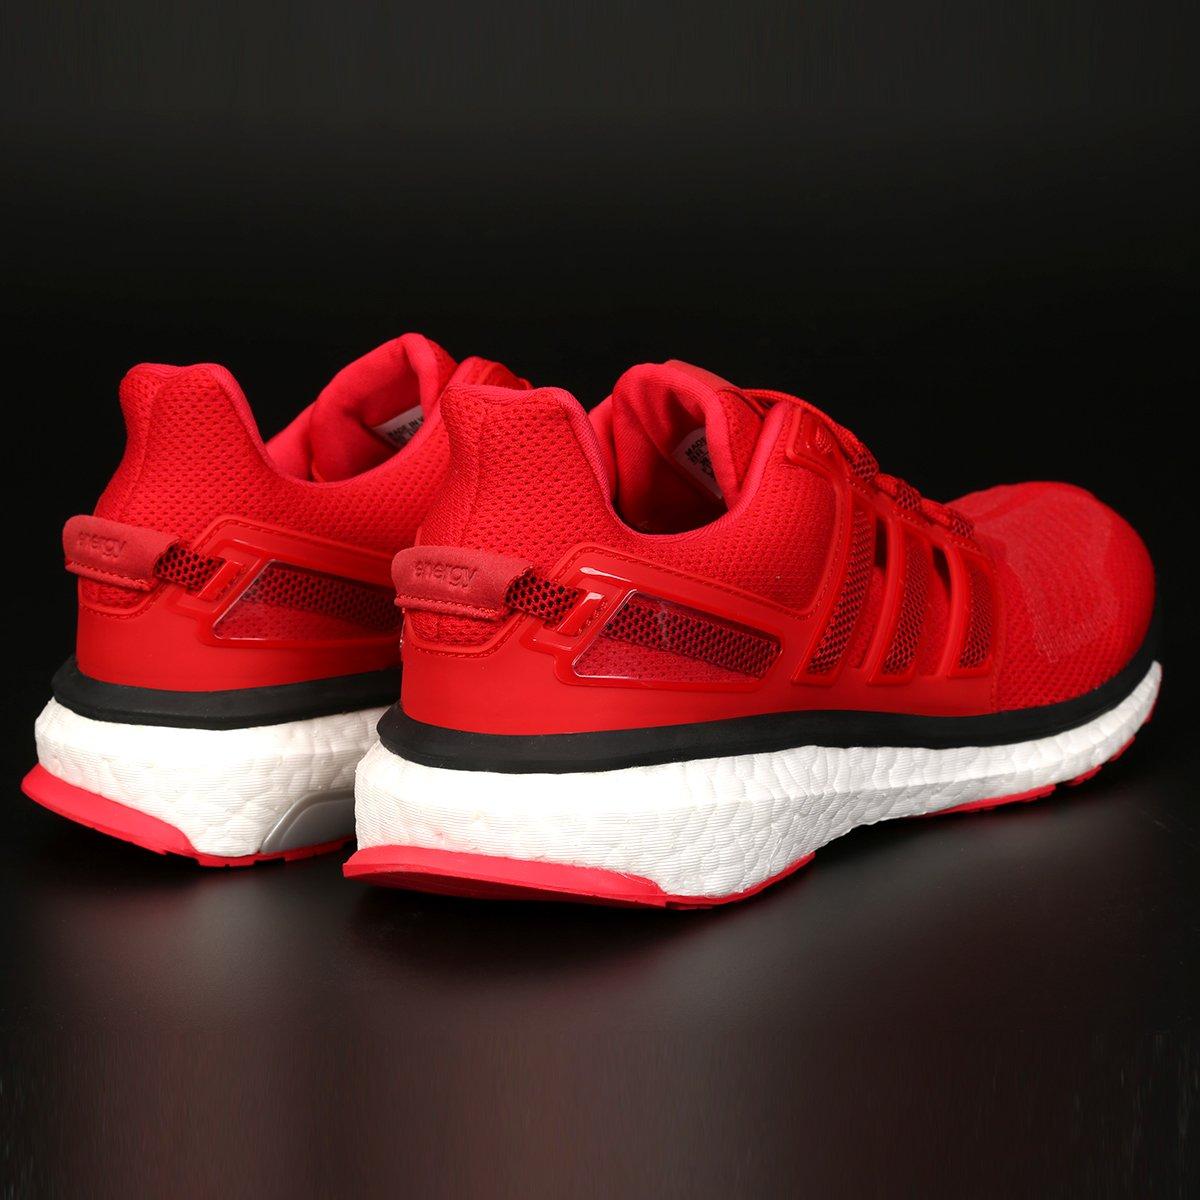 Tênis Adidas Energy Boost 3 Masculino - Compre Agora  1c01620f2f7b0